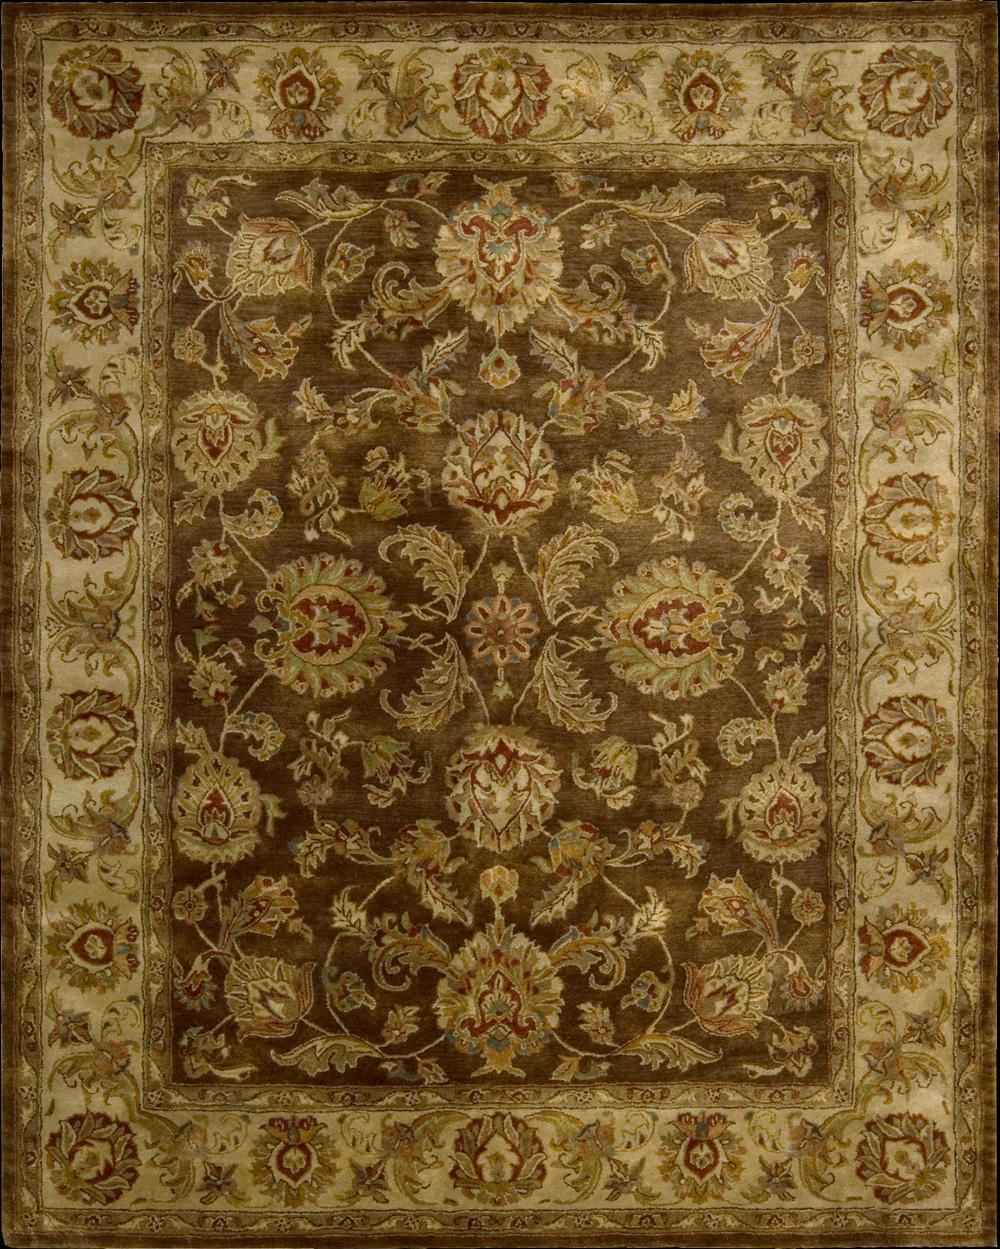 "Nourison Jaipur Area Rug 9'6"" x 13'6"" - Item Number: 58433"